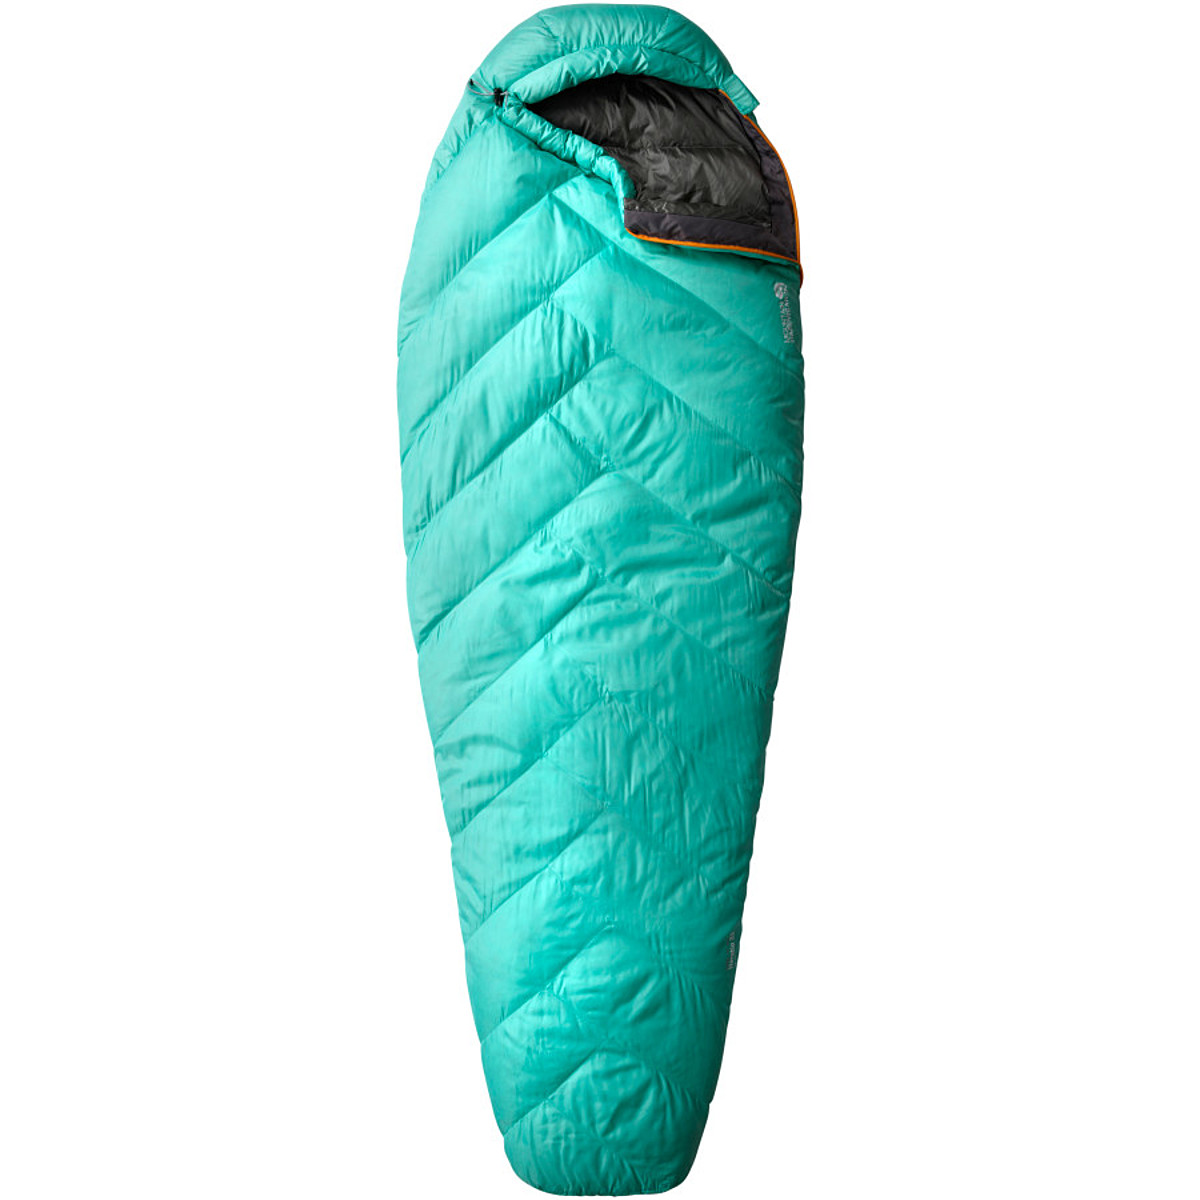 Mountain Hardwear Heratio 32